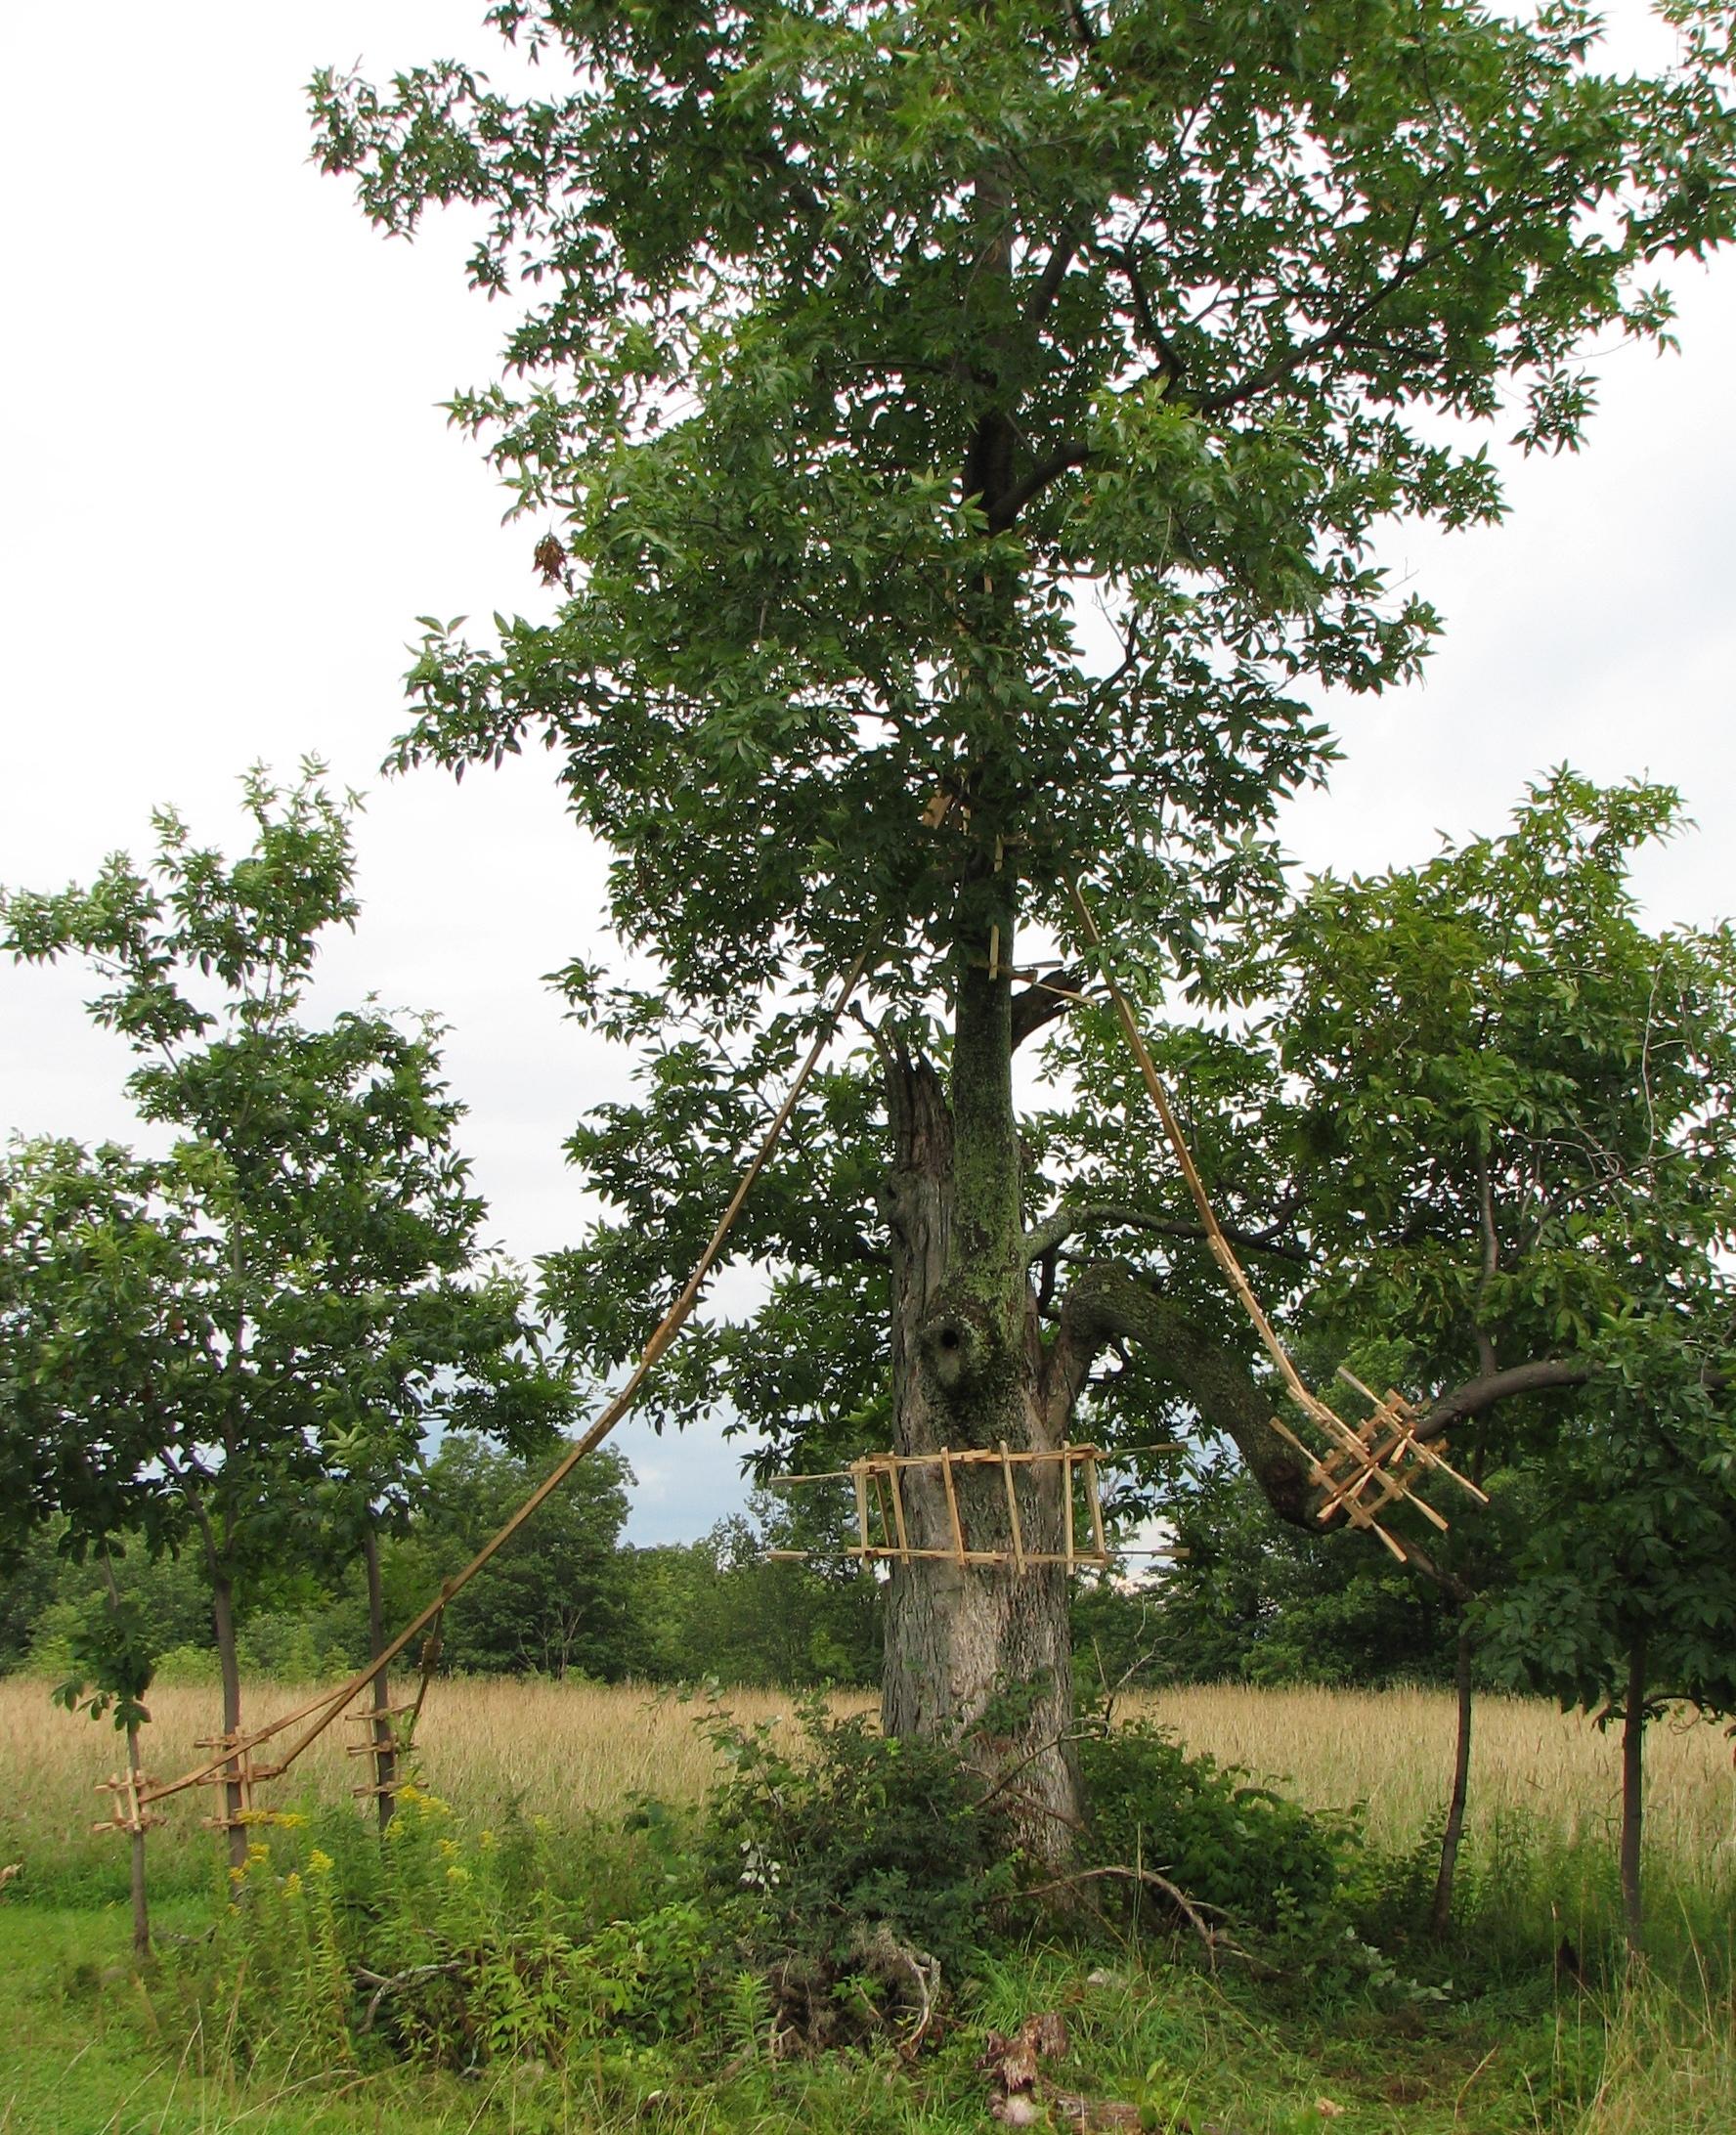 The Oath of the Horatii, bitternut hickory tree with hickory and pine framing, Stone Quarry Hill Art Park, Cazenovia, NY